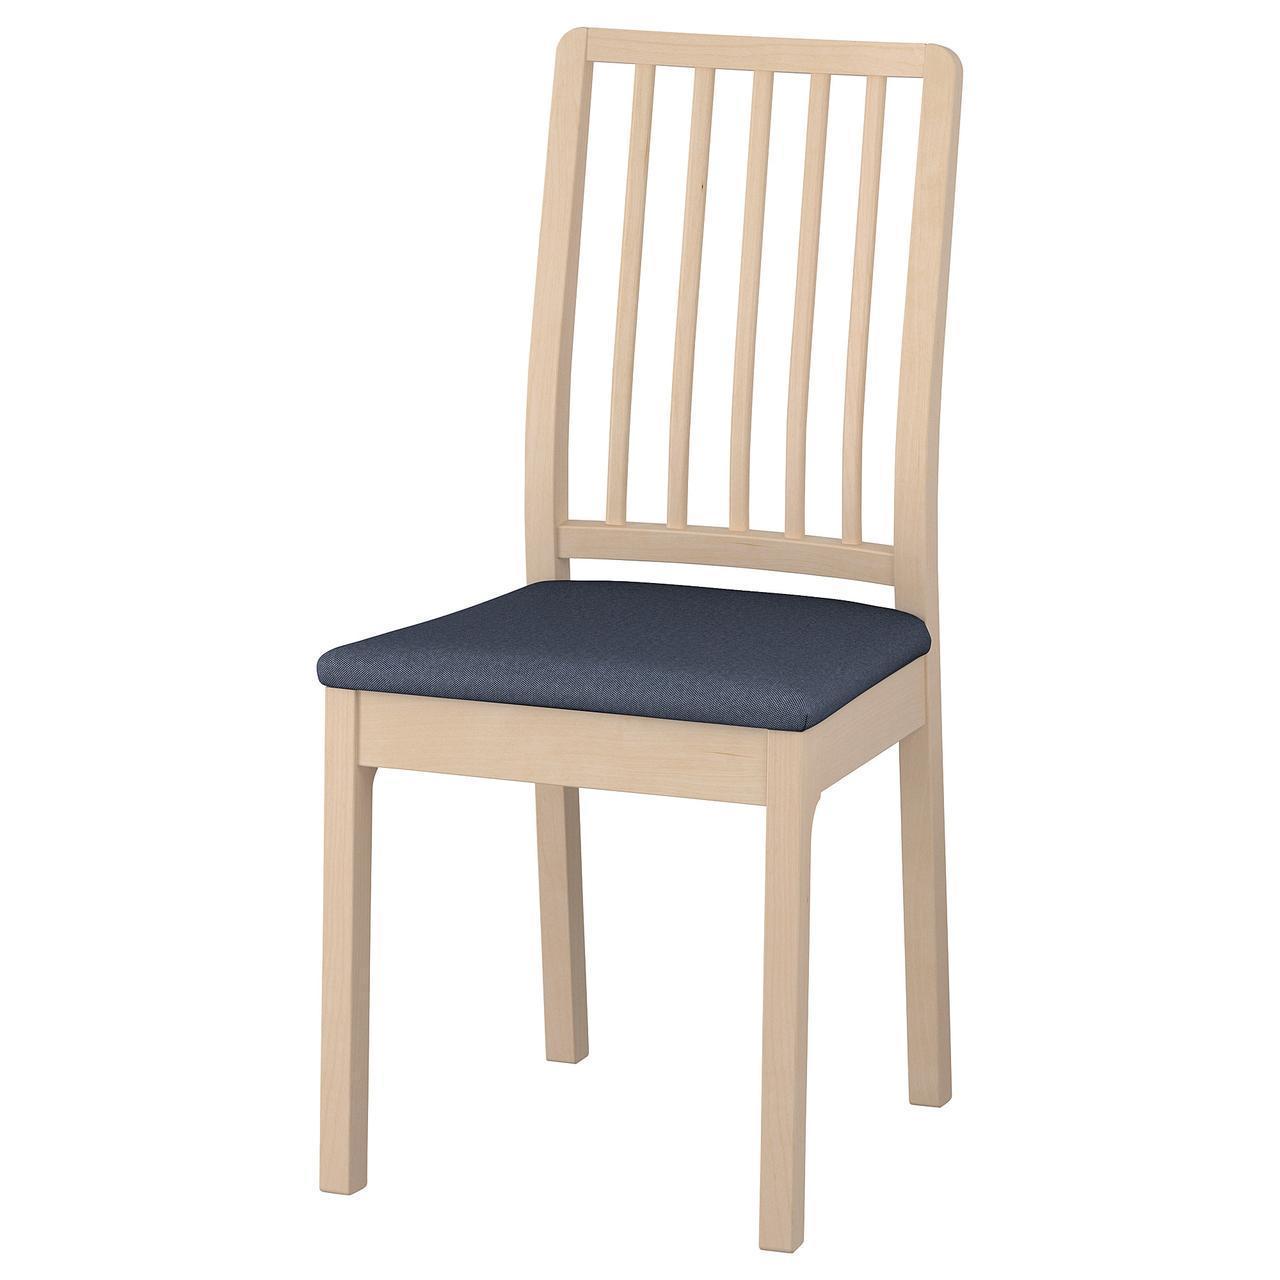 Кресло кухонное IKEA EKEDALEN Orrsta береза темно-синее 992.652.61